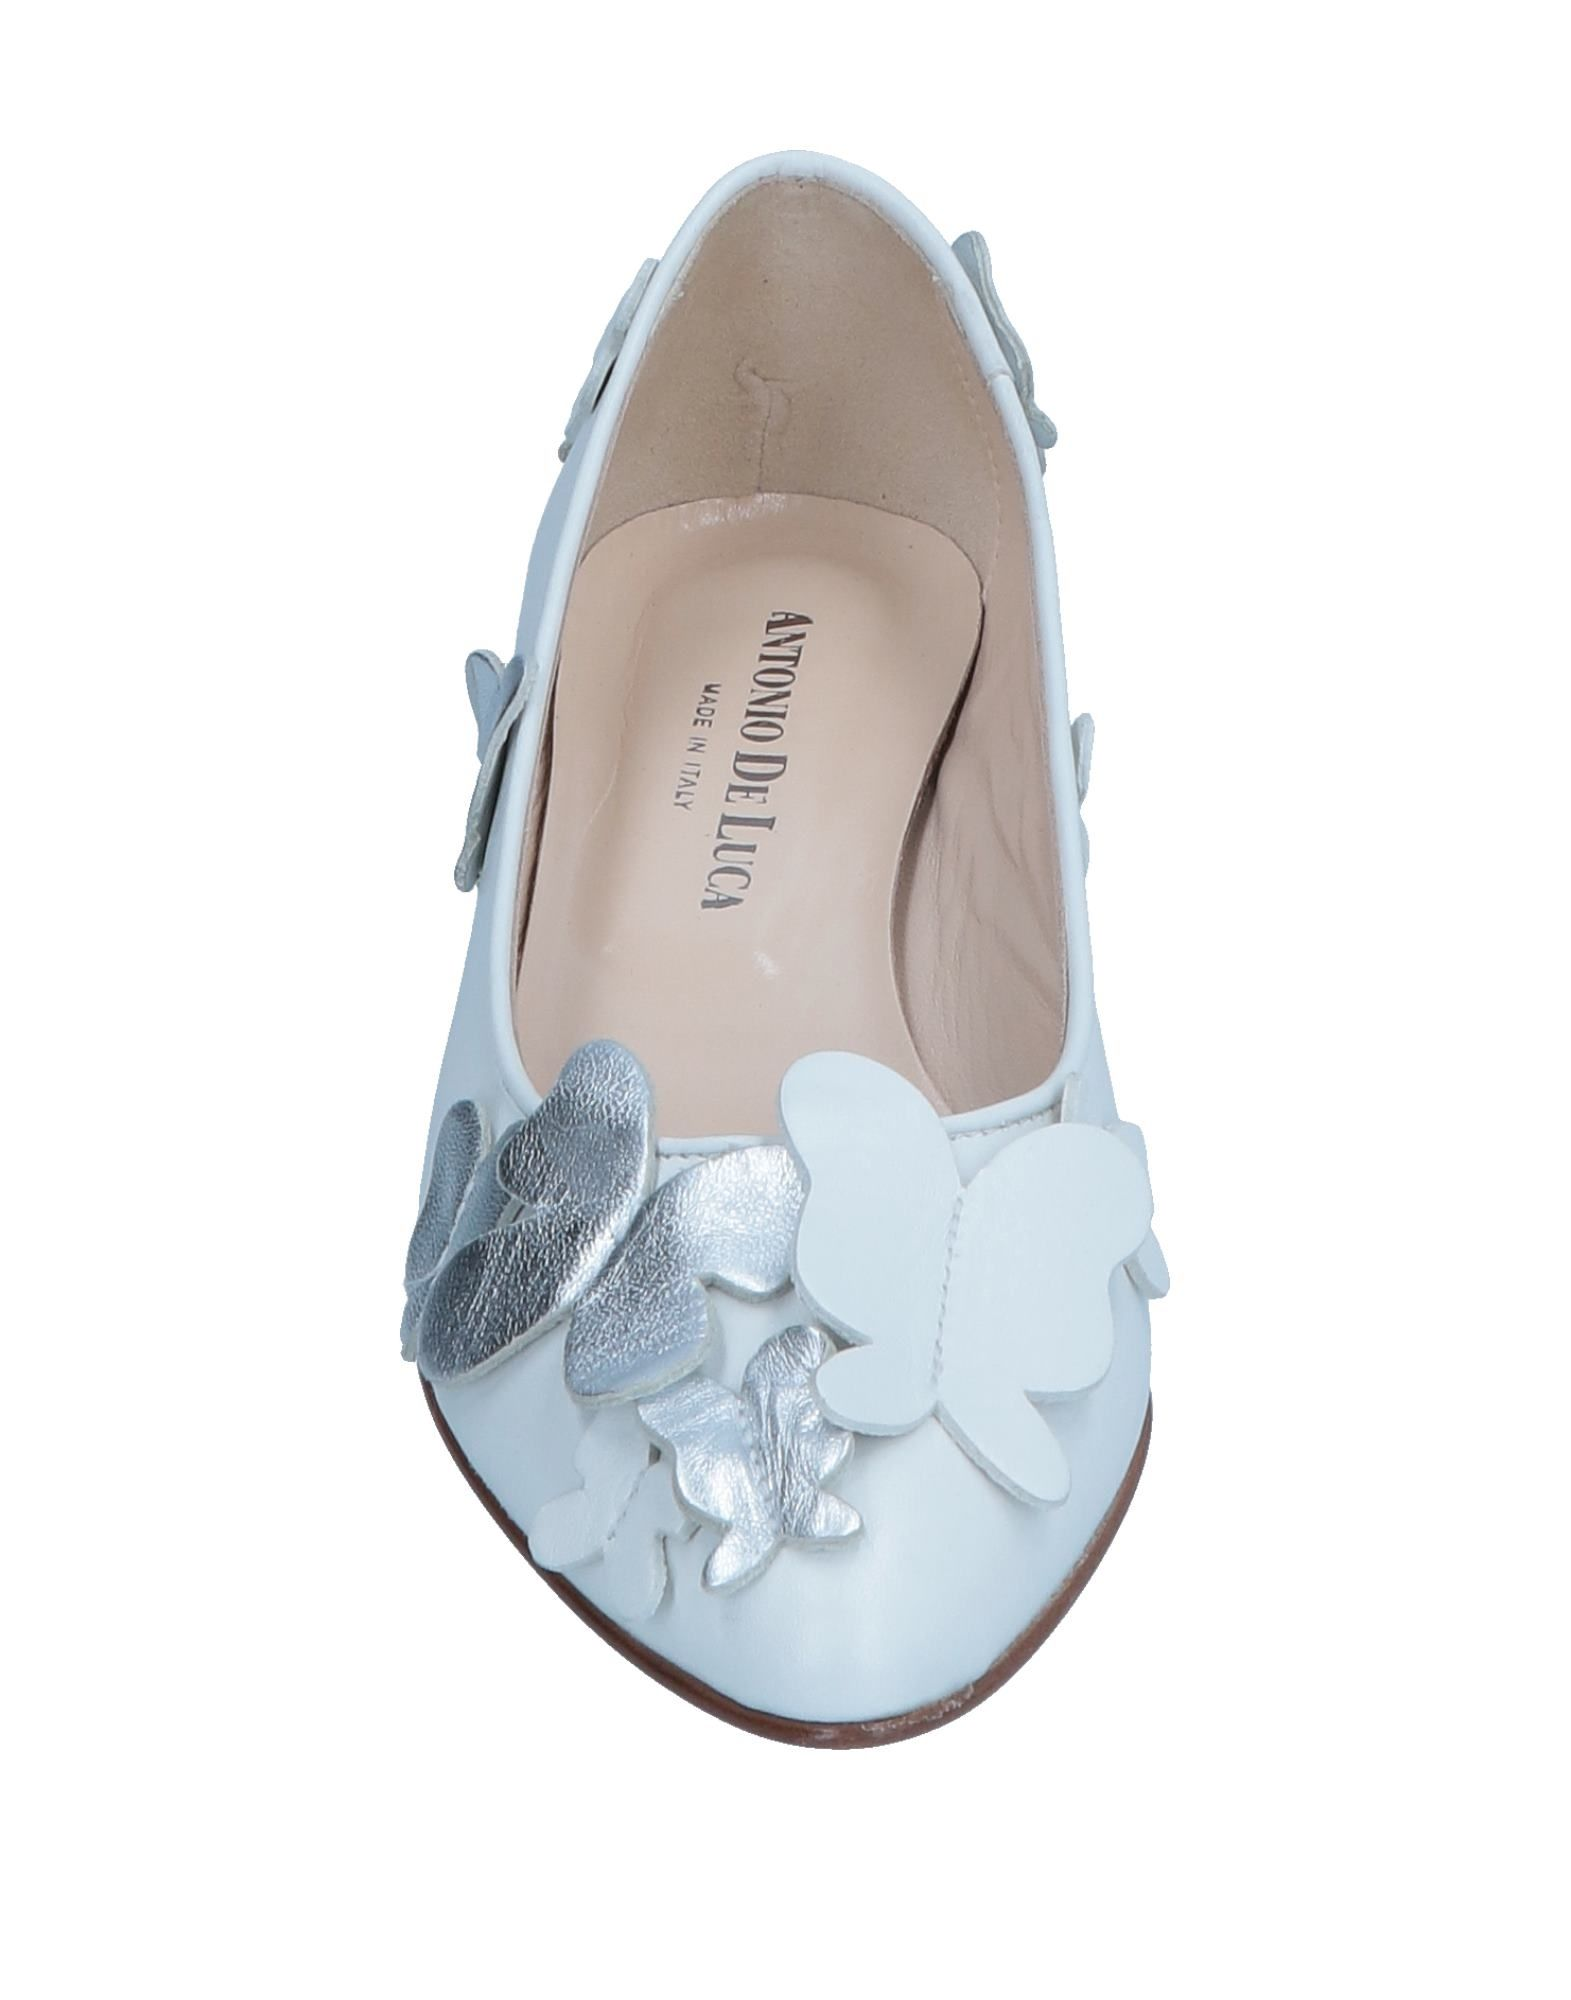 Antonio De Luca Ballerinas Damen Damen Damen  11552831BF Gute Qualität beliebte Schuhe 43f70a